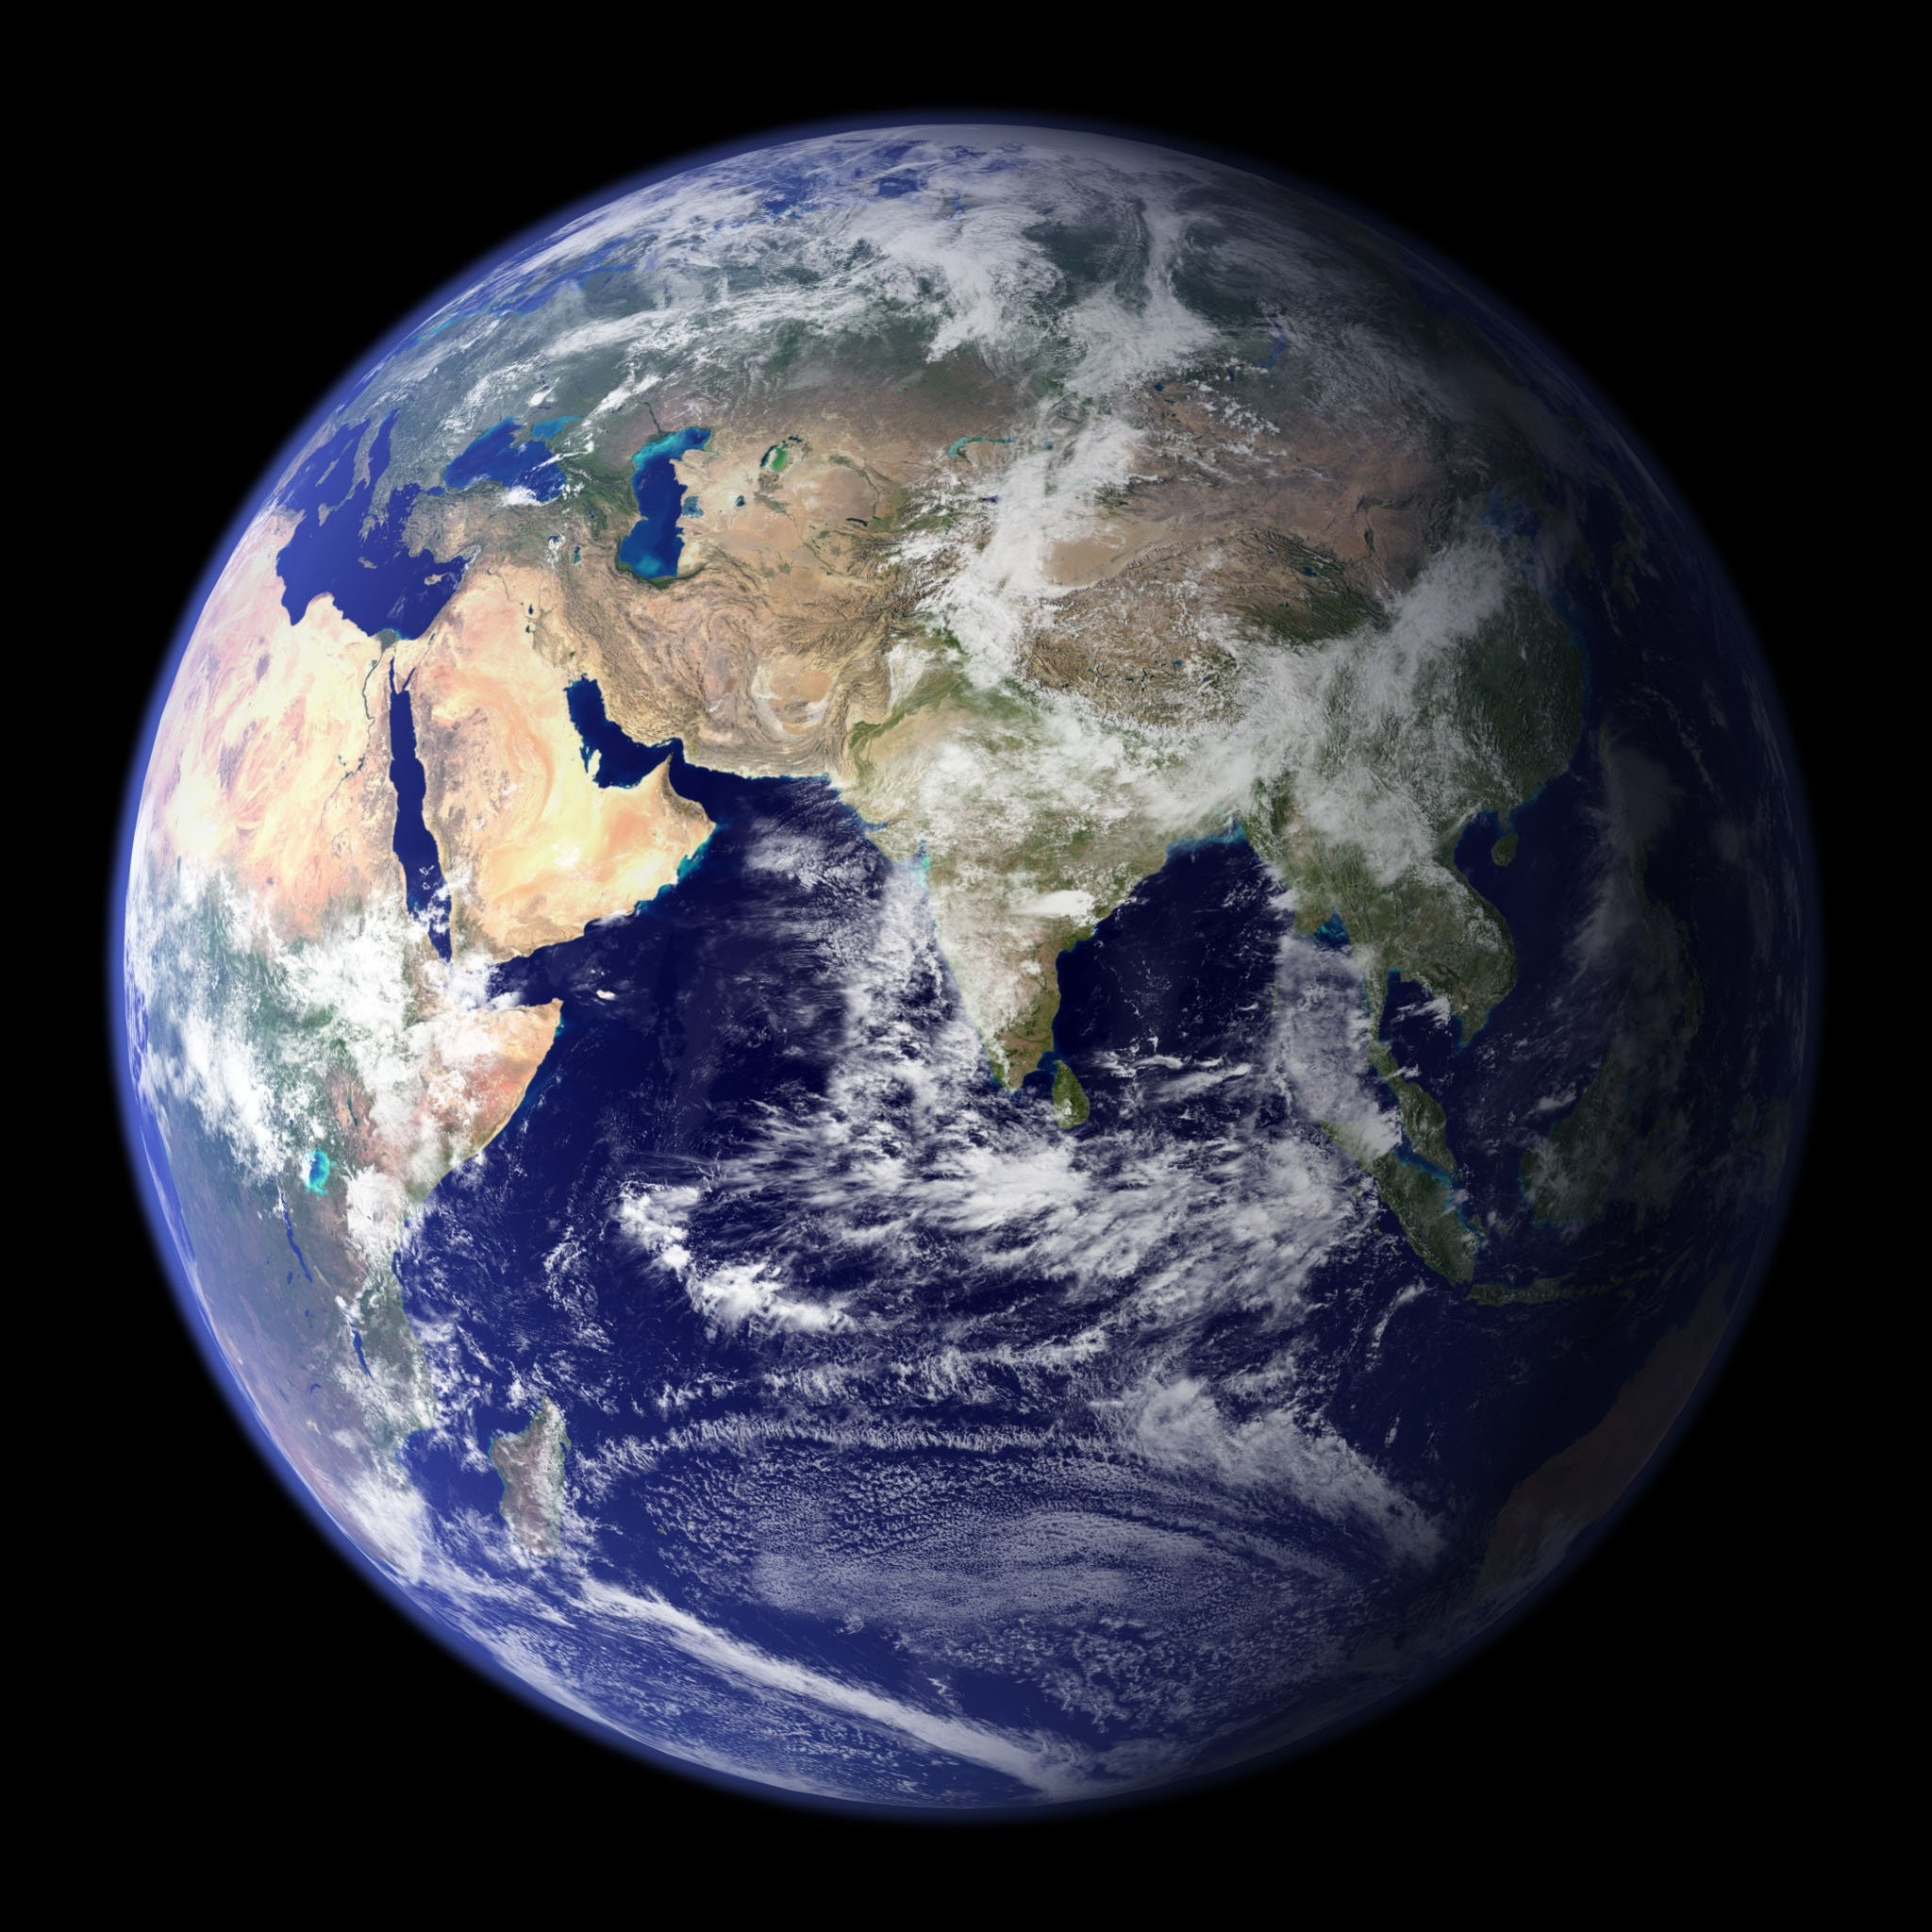 Earth Wallpaper Free Stock Photo